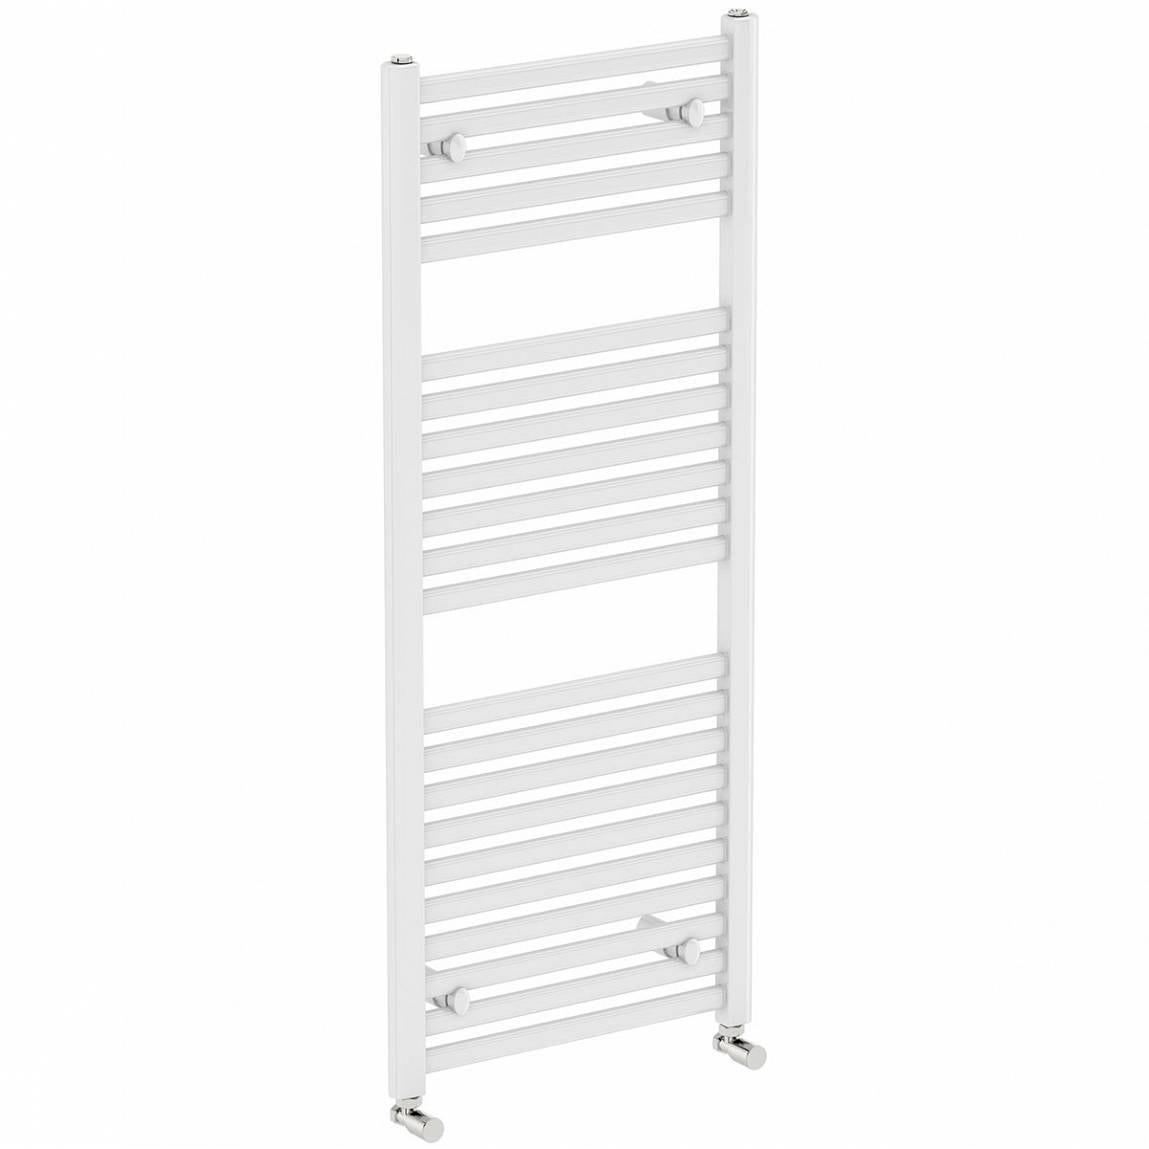 Clarity White heated towel rail 1200 x 600